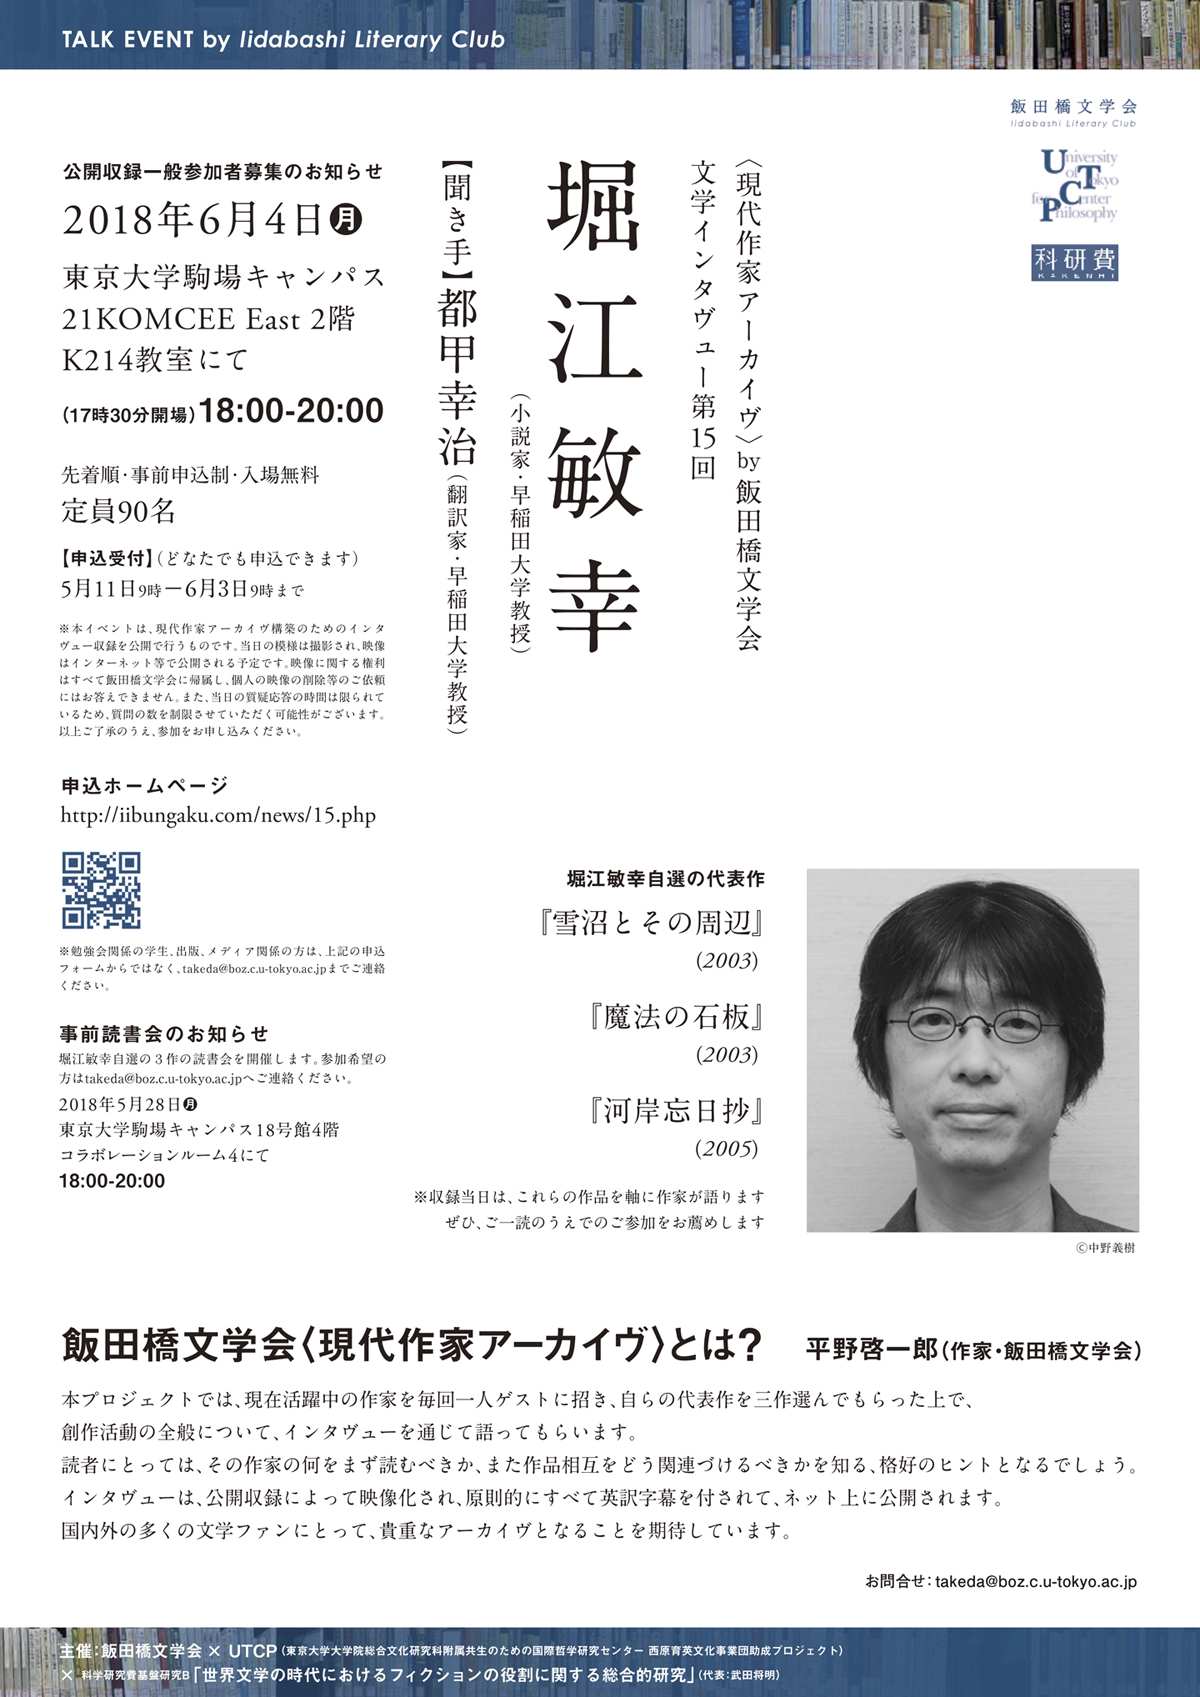 http://iibungaku.com/horie180517_s.jpg